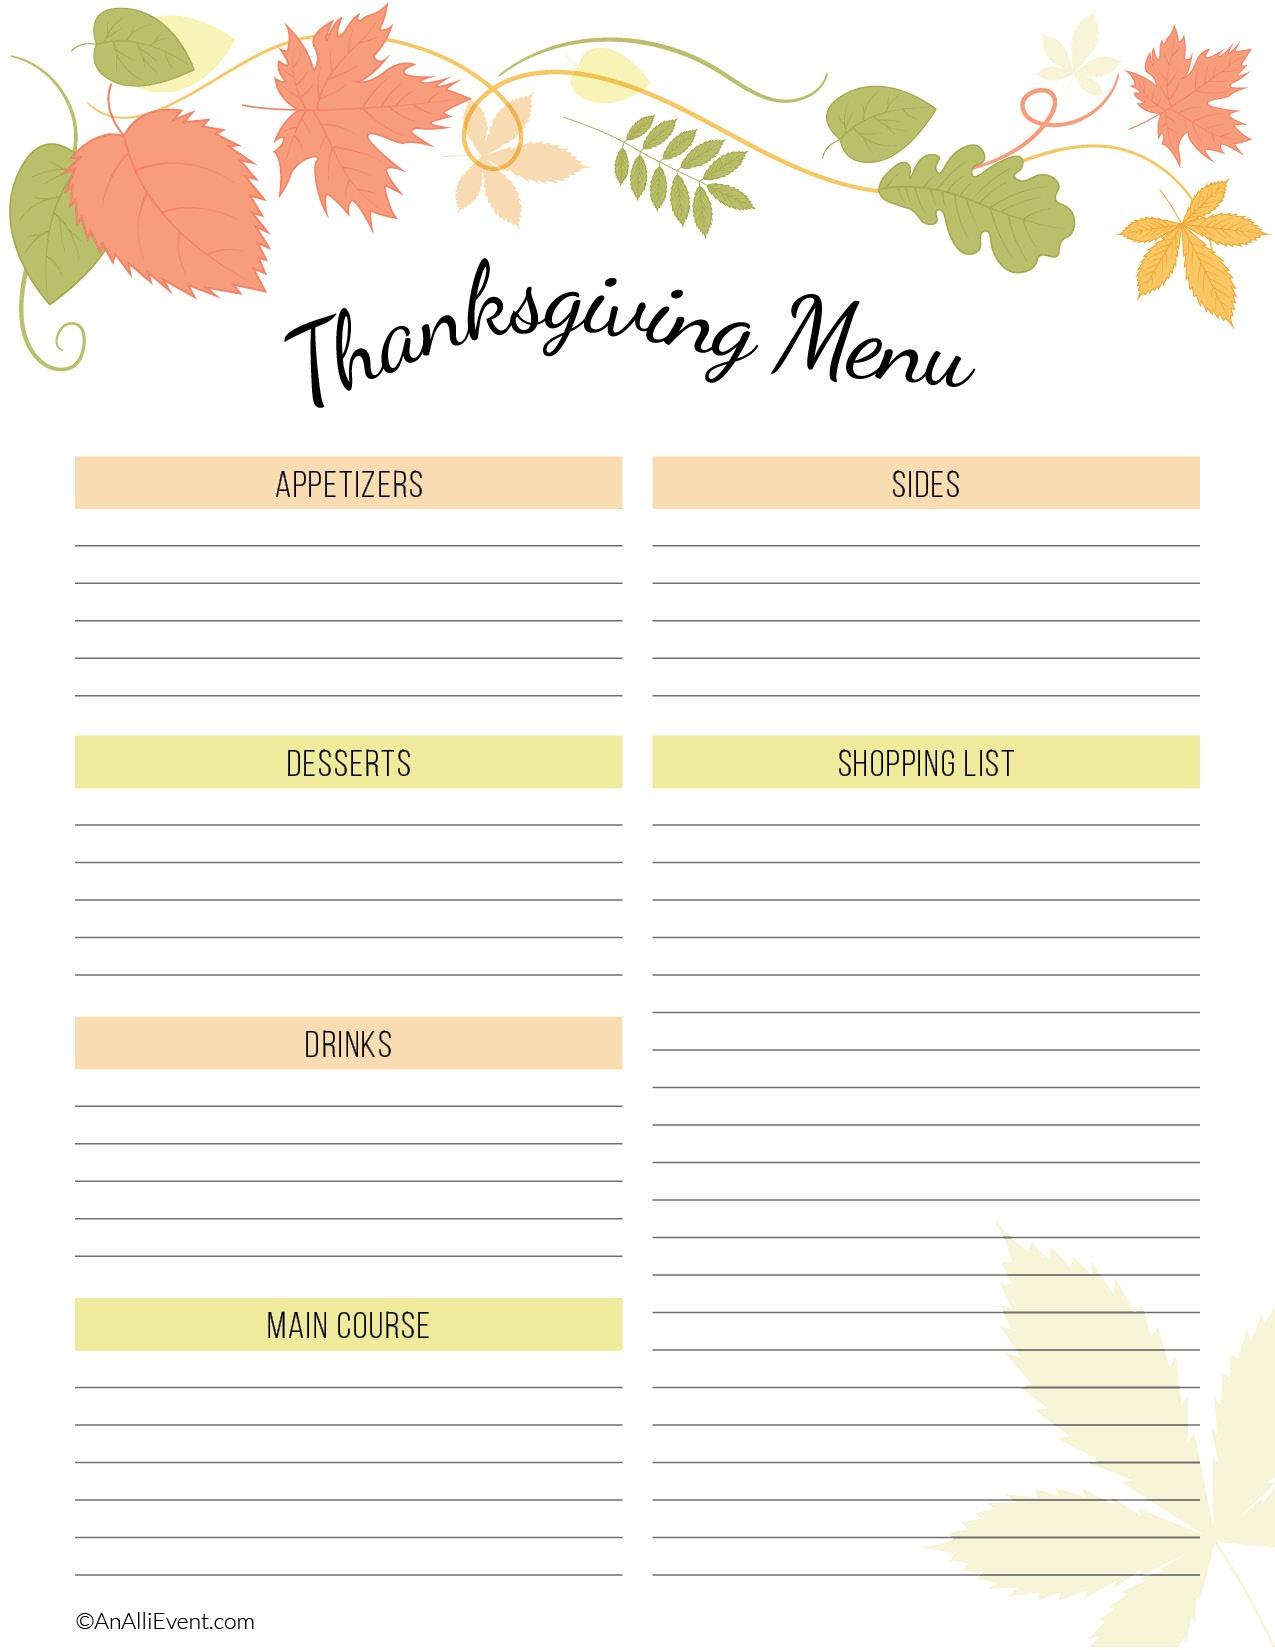 Free Thanksgiving Planner Printable - An Alli Event - Free Printable Thanksgiving Menu Template